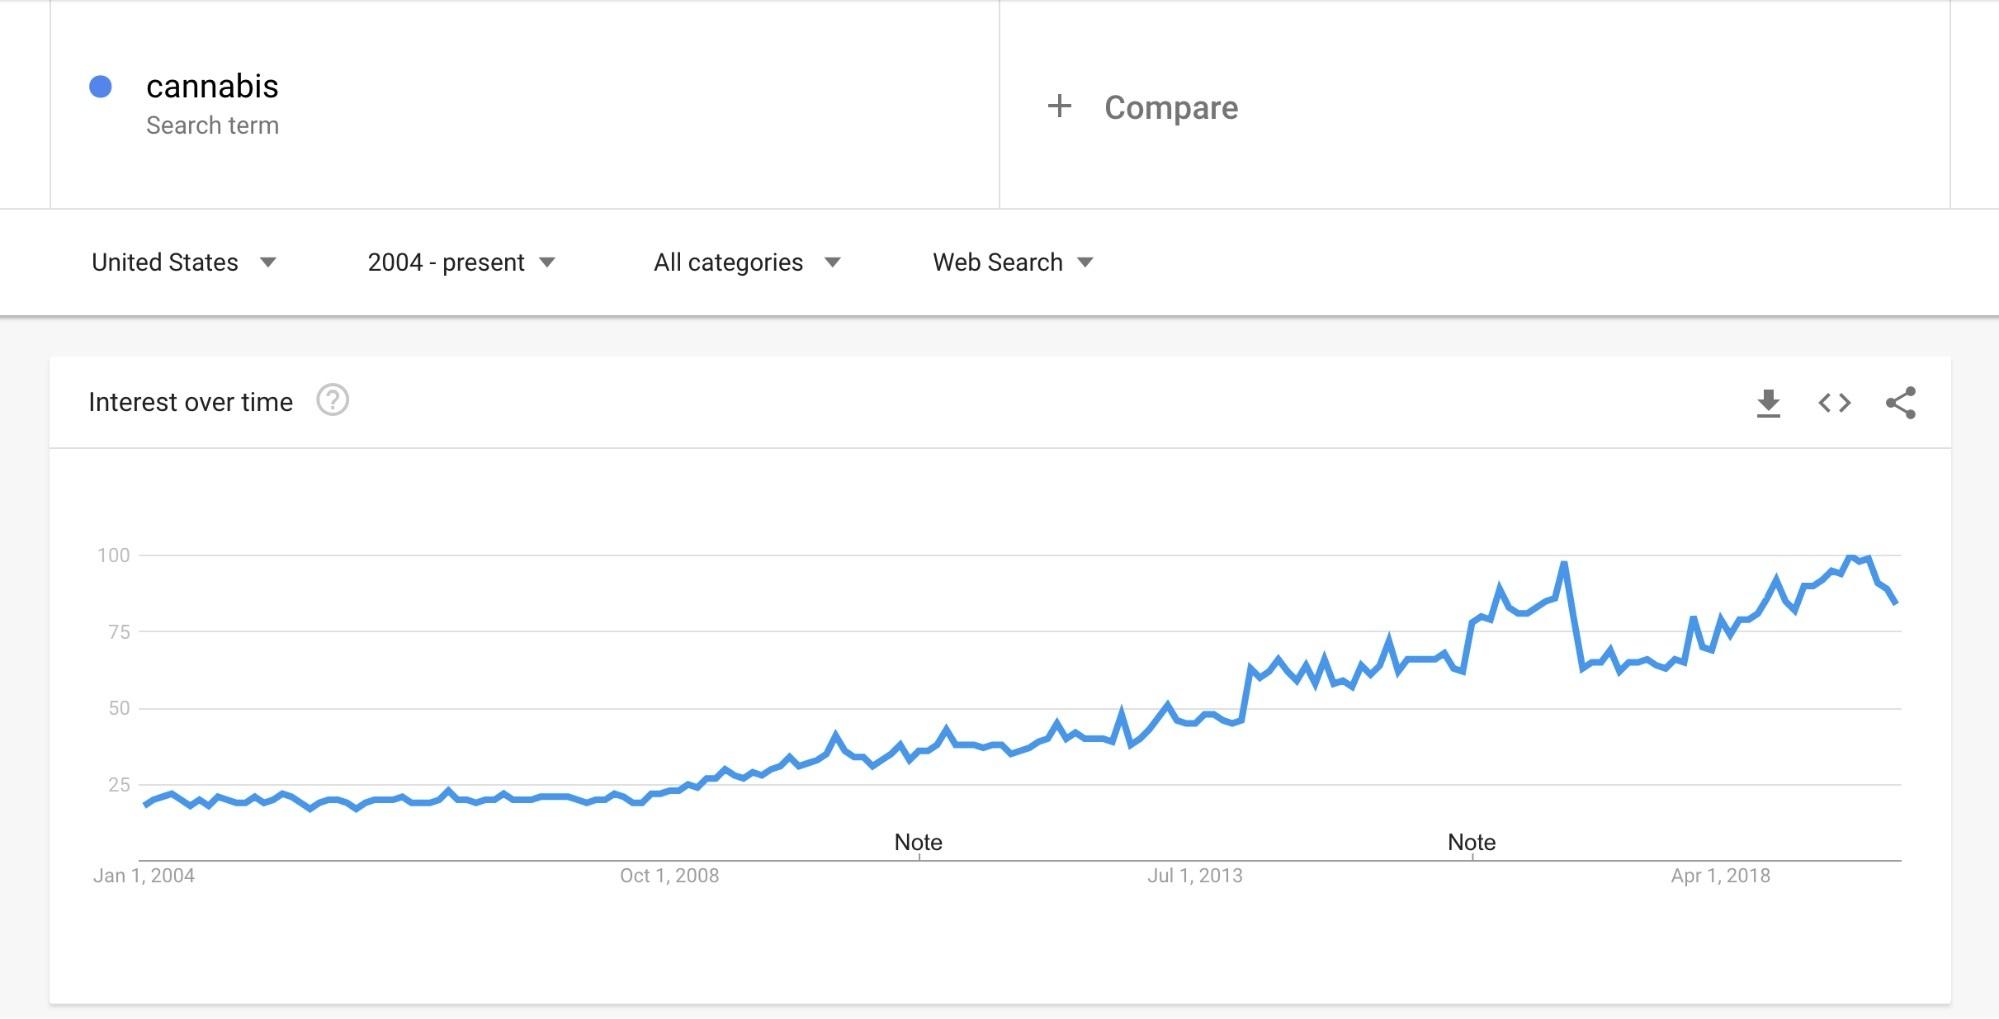 Cannabis SEO charts from Google